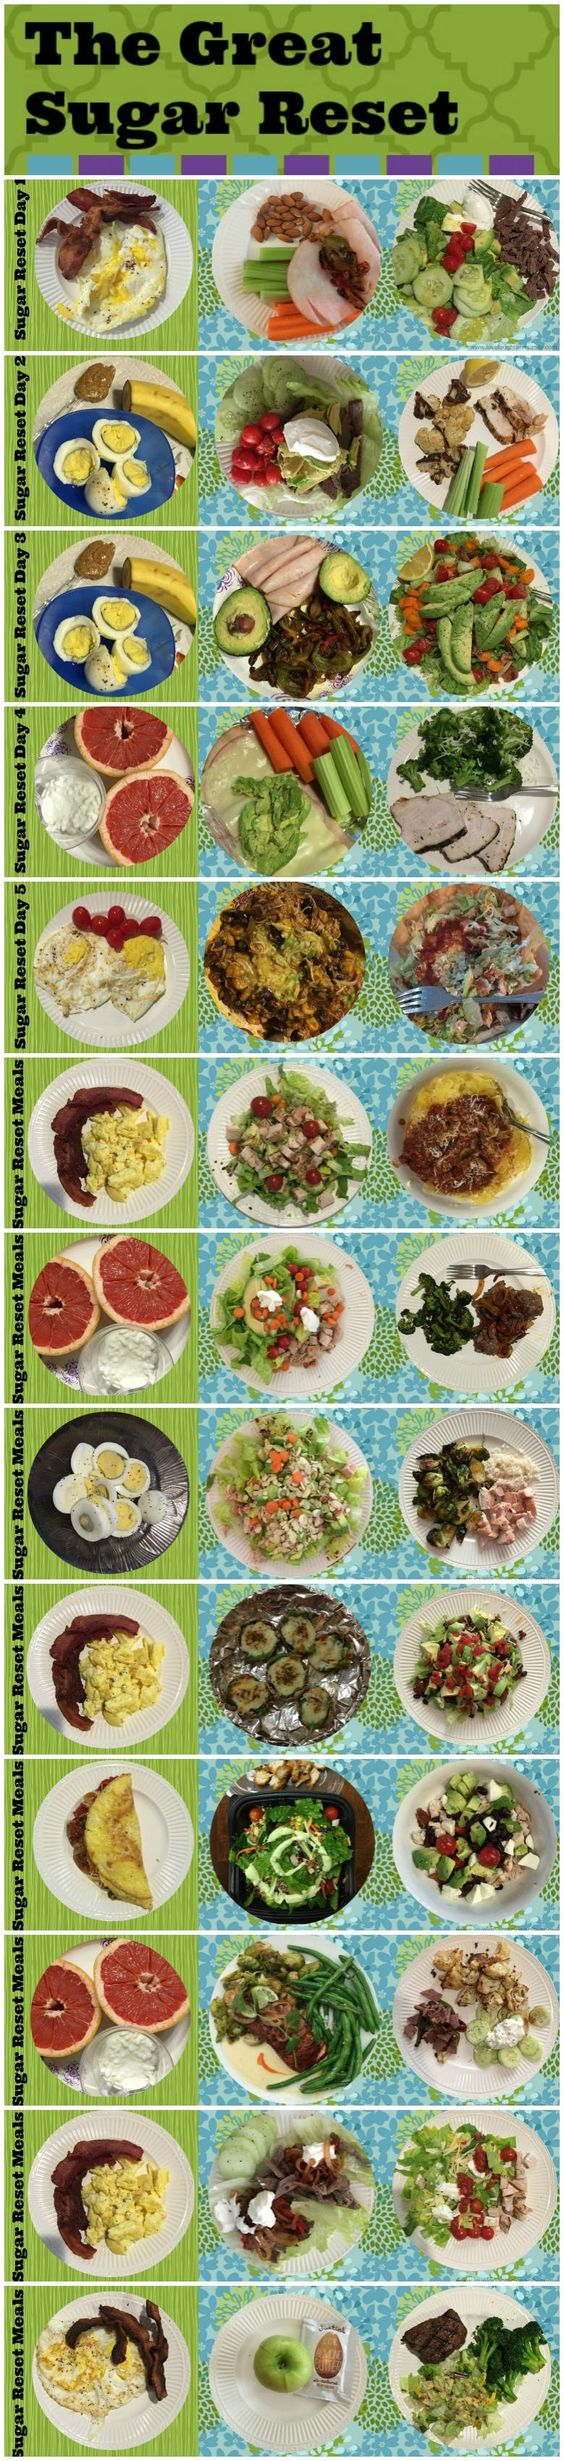 21 Day Sugar Detox // Sample Meals